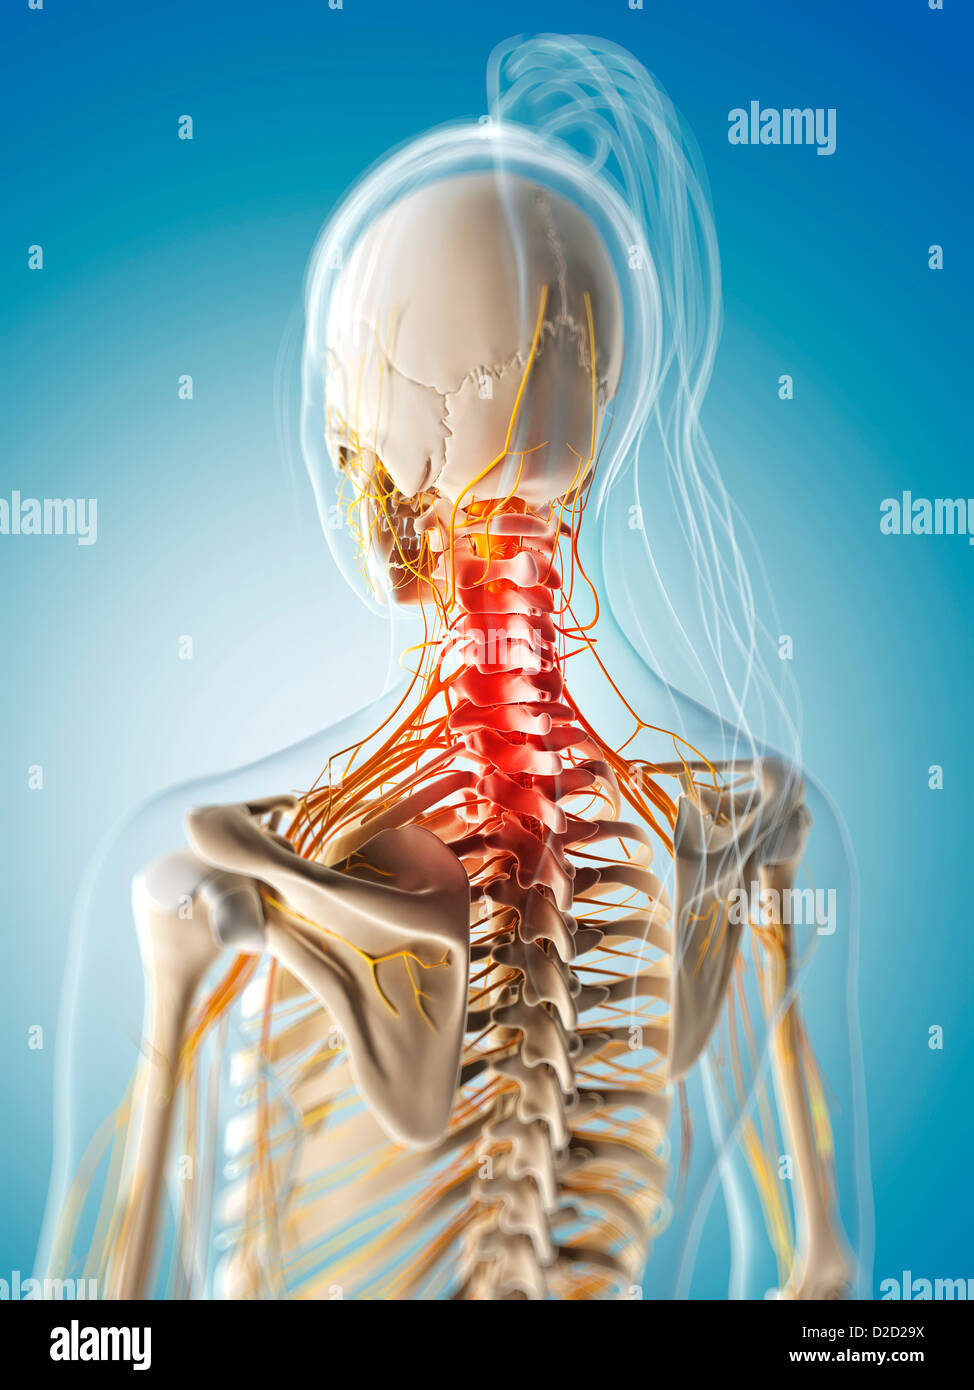 Neck pain conceptual computer artwork Stock Photo: 53147638 - Alamy